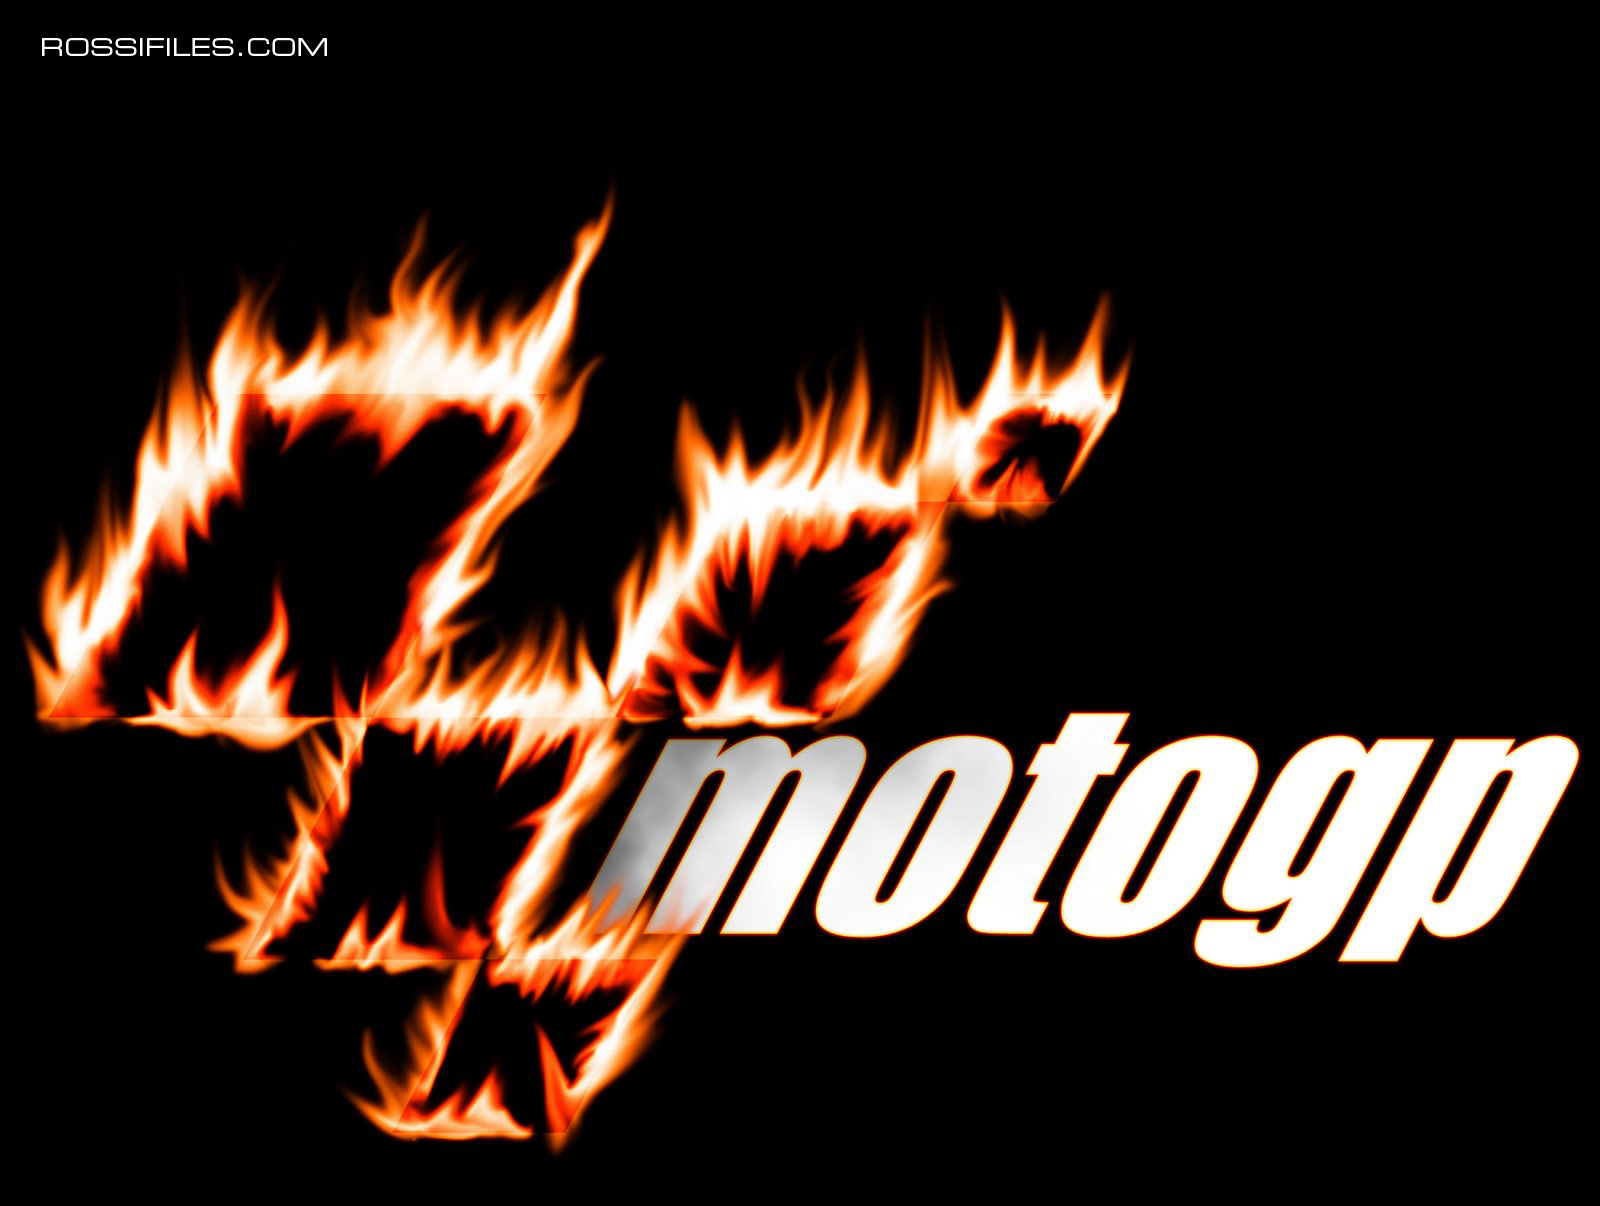 http://3.bp.blogspot.com/_LC3oejkOaKc/SwqK1a4Bn7I/AAAAAAAAAD8/JwQgGpCAw4g/S1600-R/motogpflagonfire.jpg